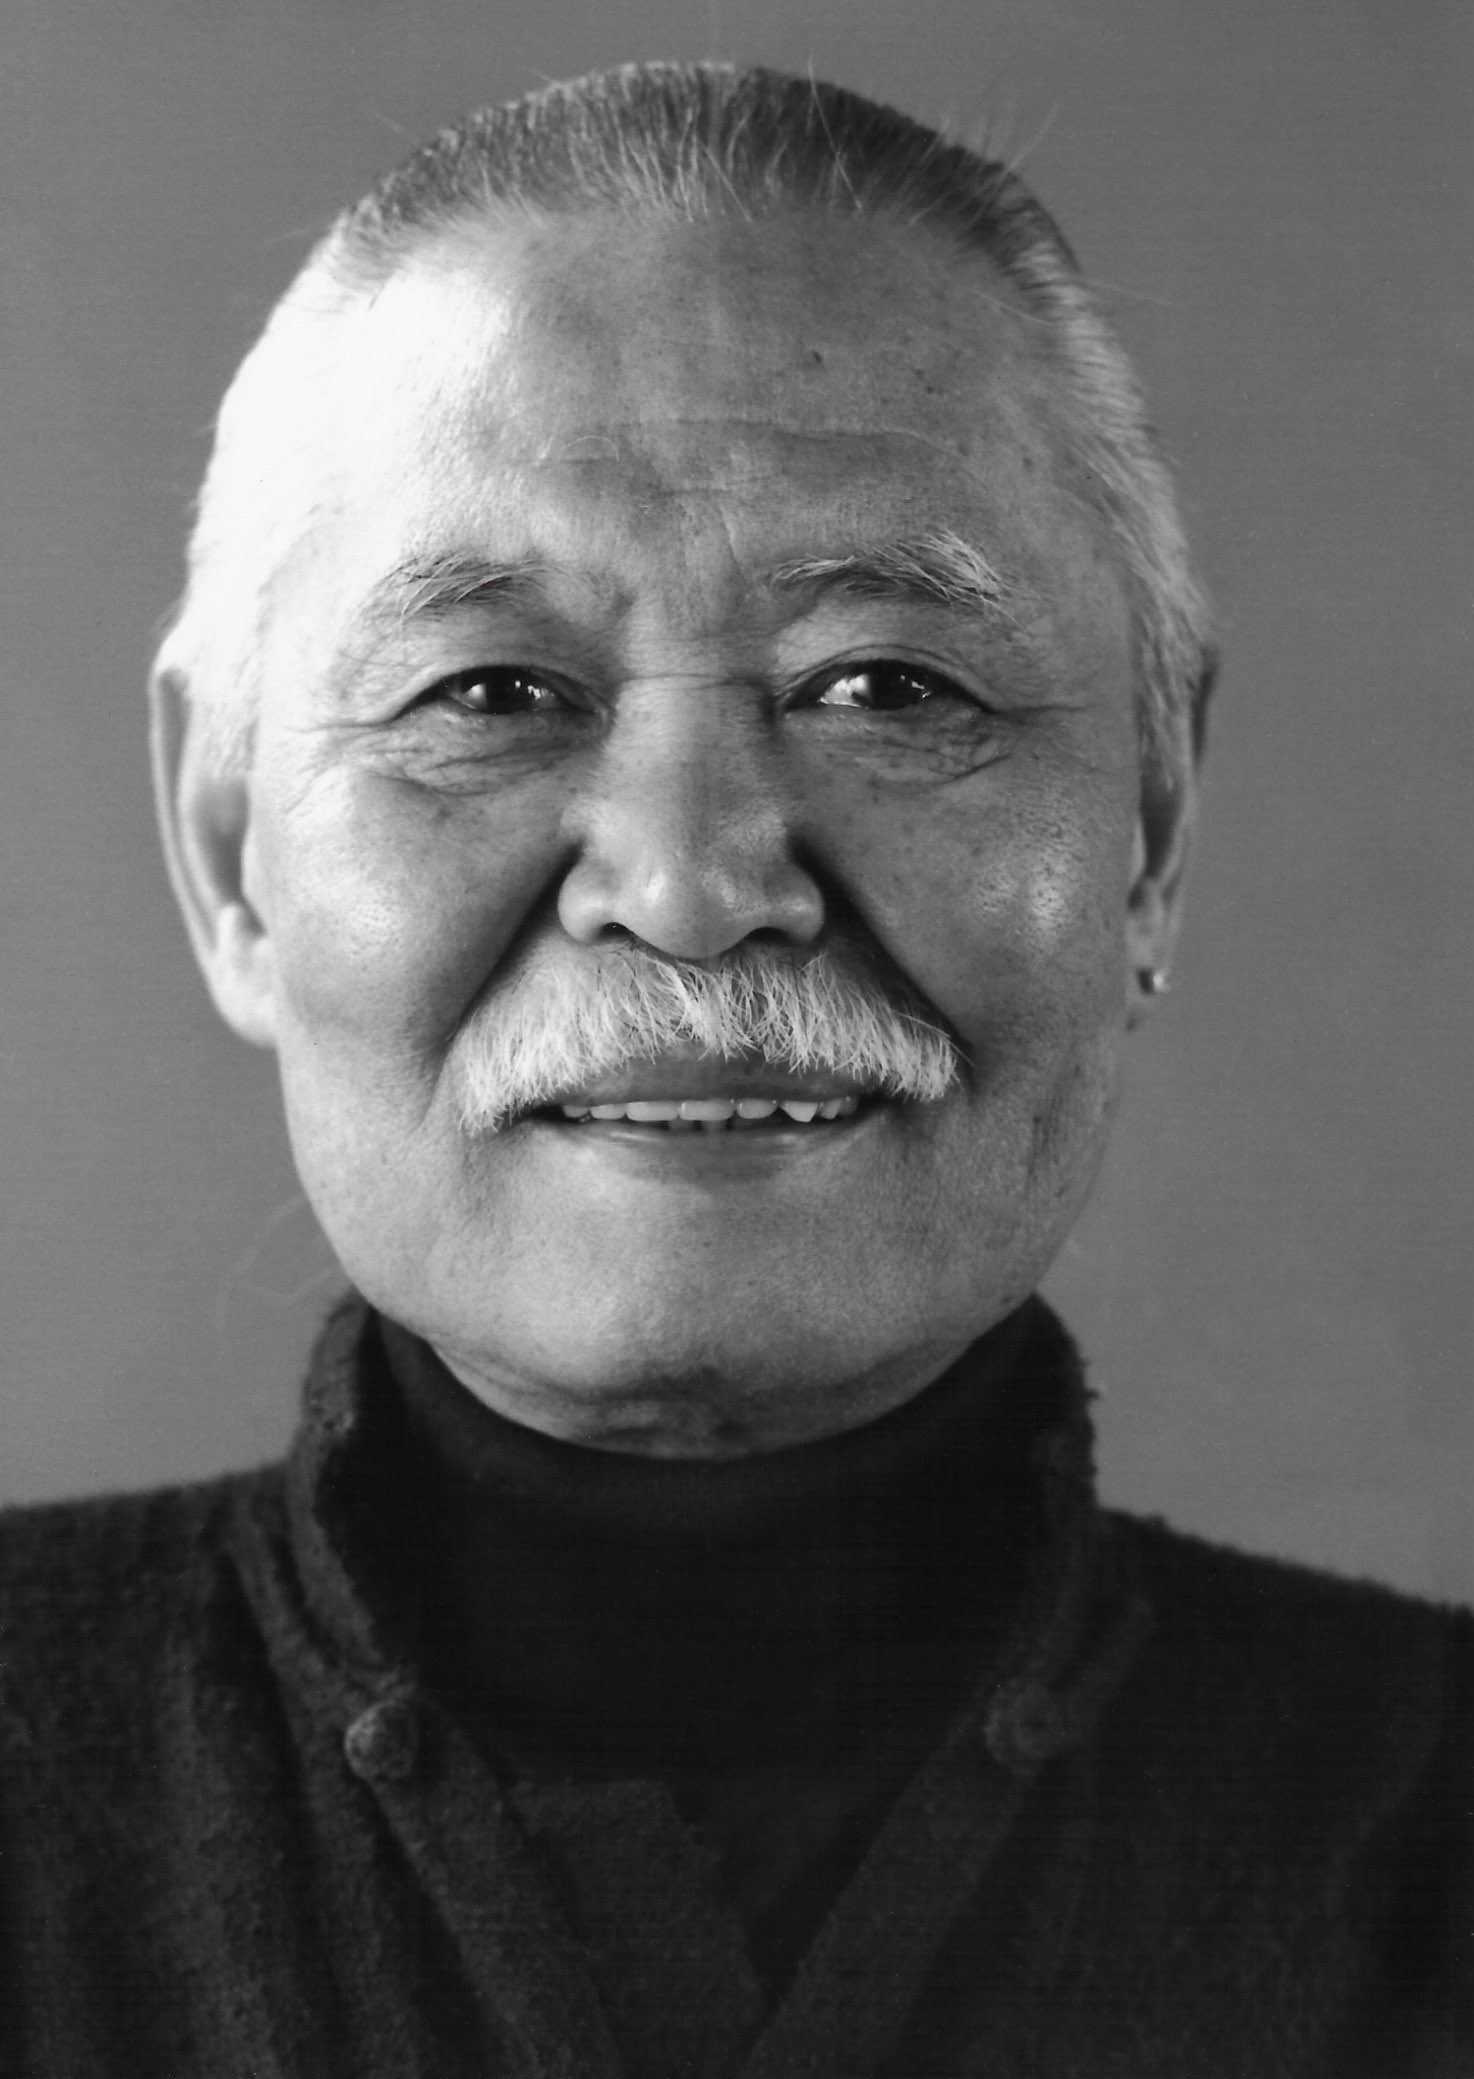 Kanemitsu photographed by Kenji Shirato.